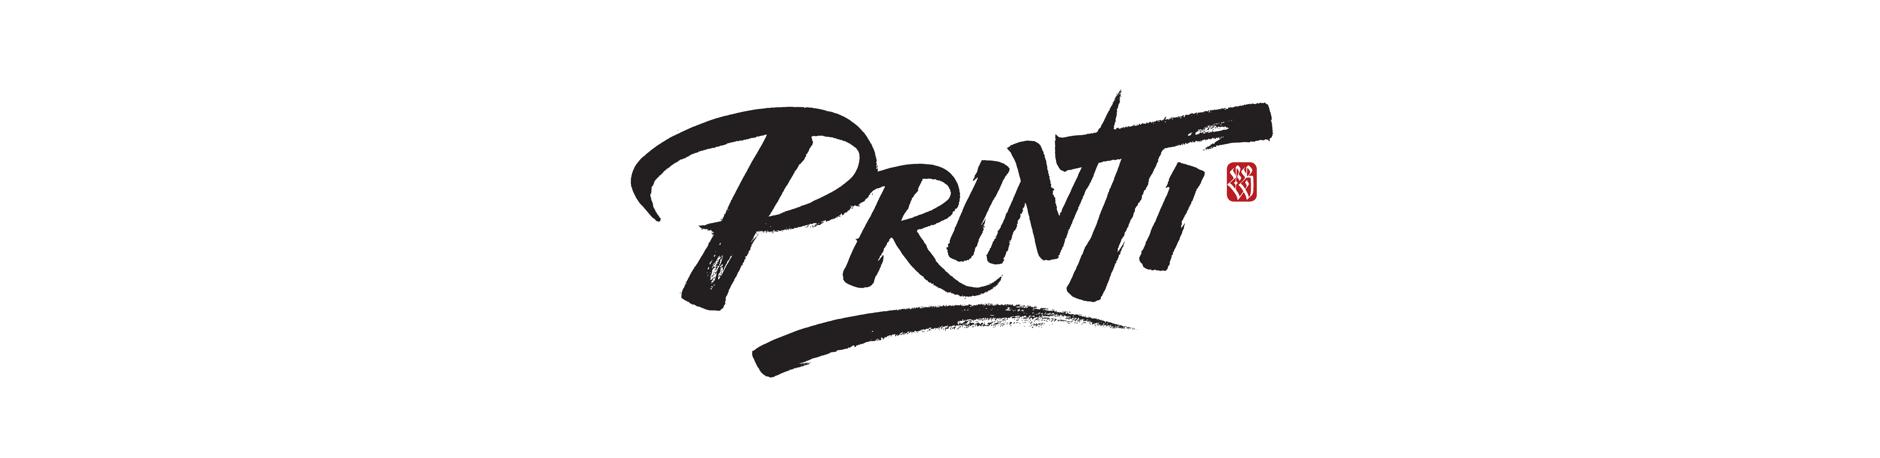 printi_logo.png